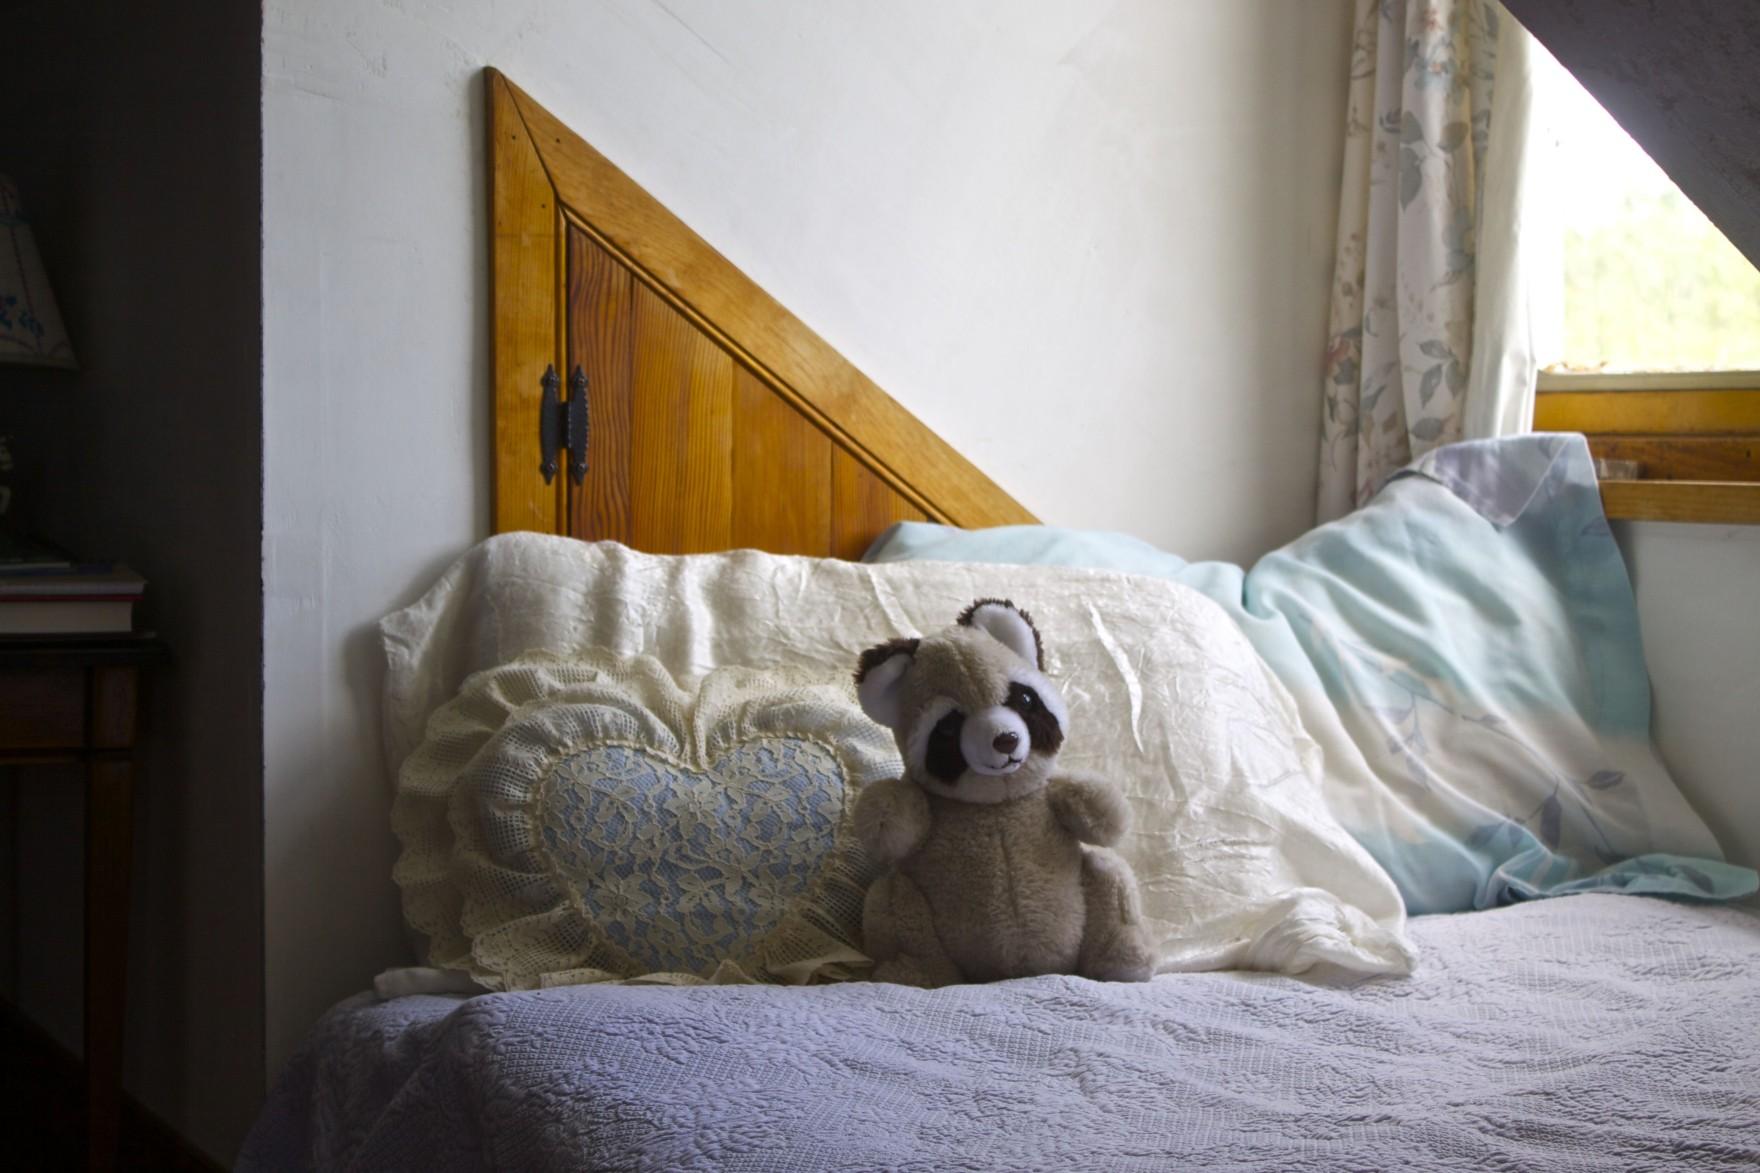 The Bored Vegetarian Raccoon